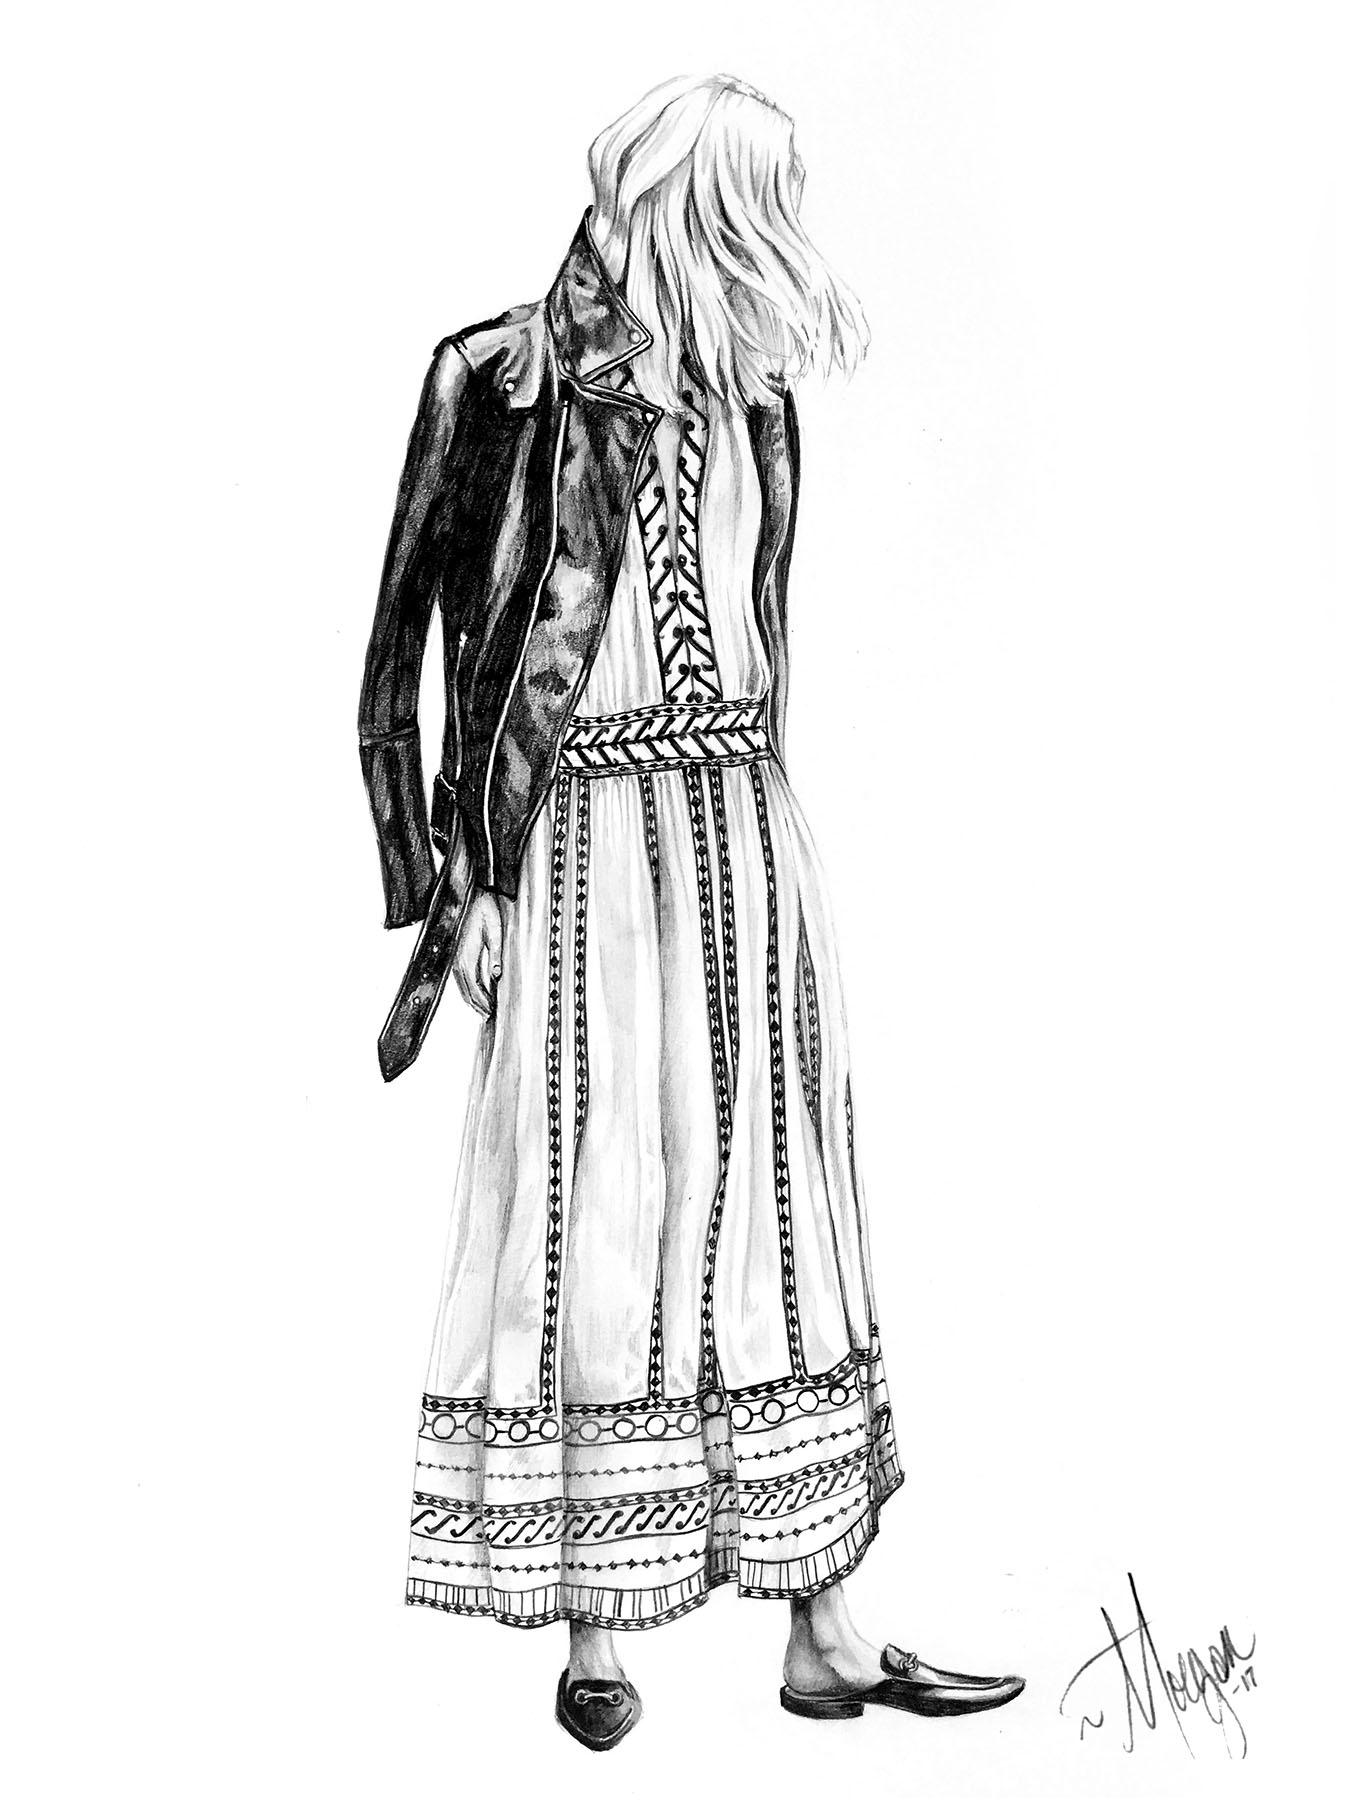 maxi-dress-illustration-morgan-swank-studio.jpg